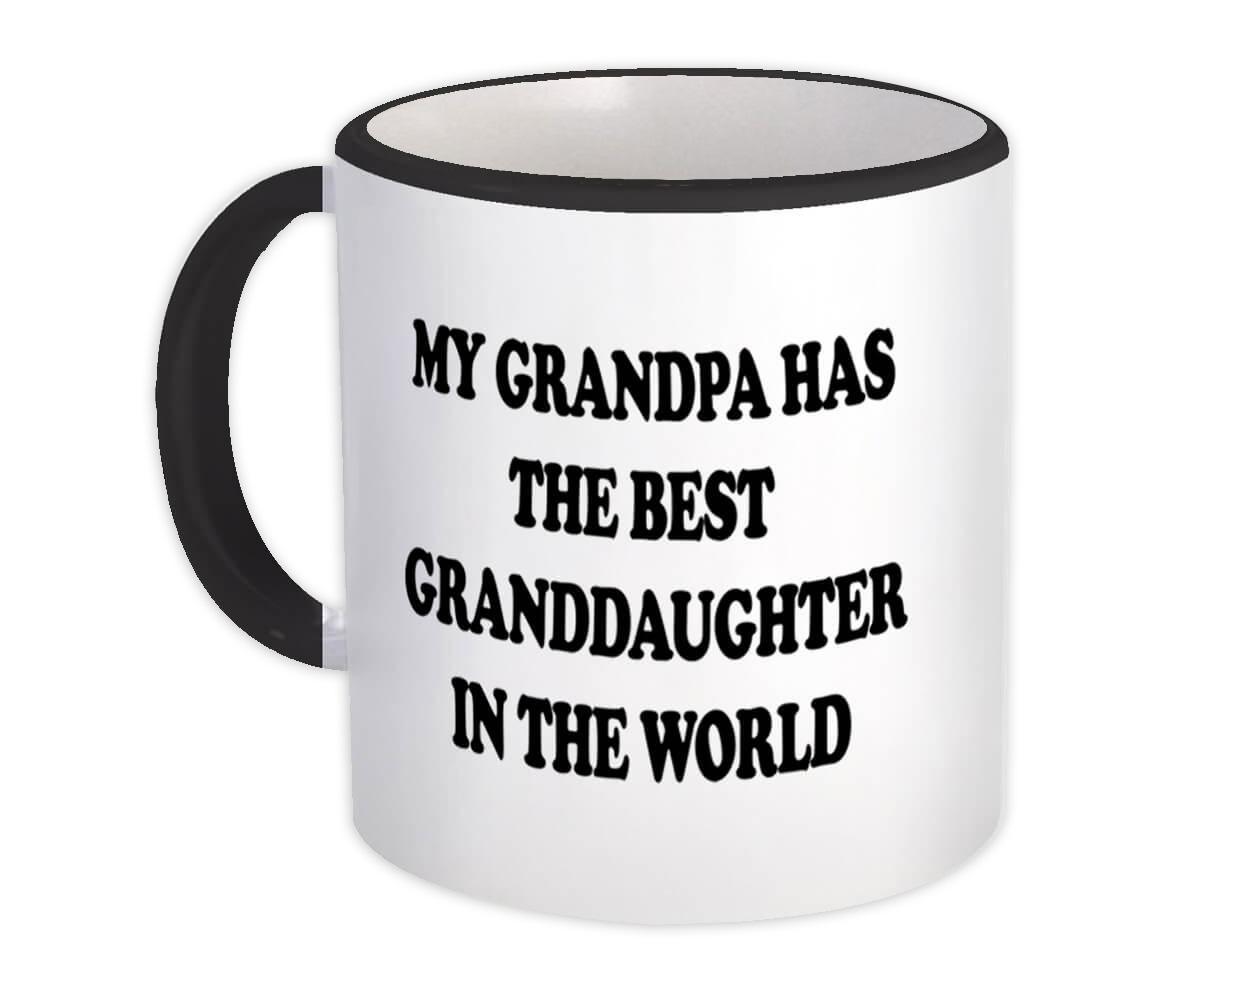 My Grandpa Has The Best Granddaughter In The World : Gift Mug Birthday